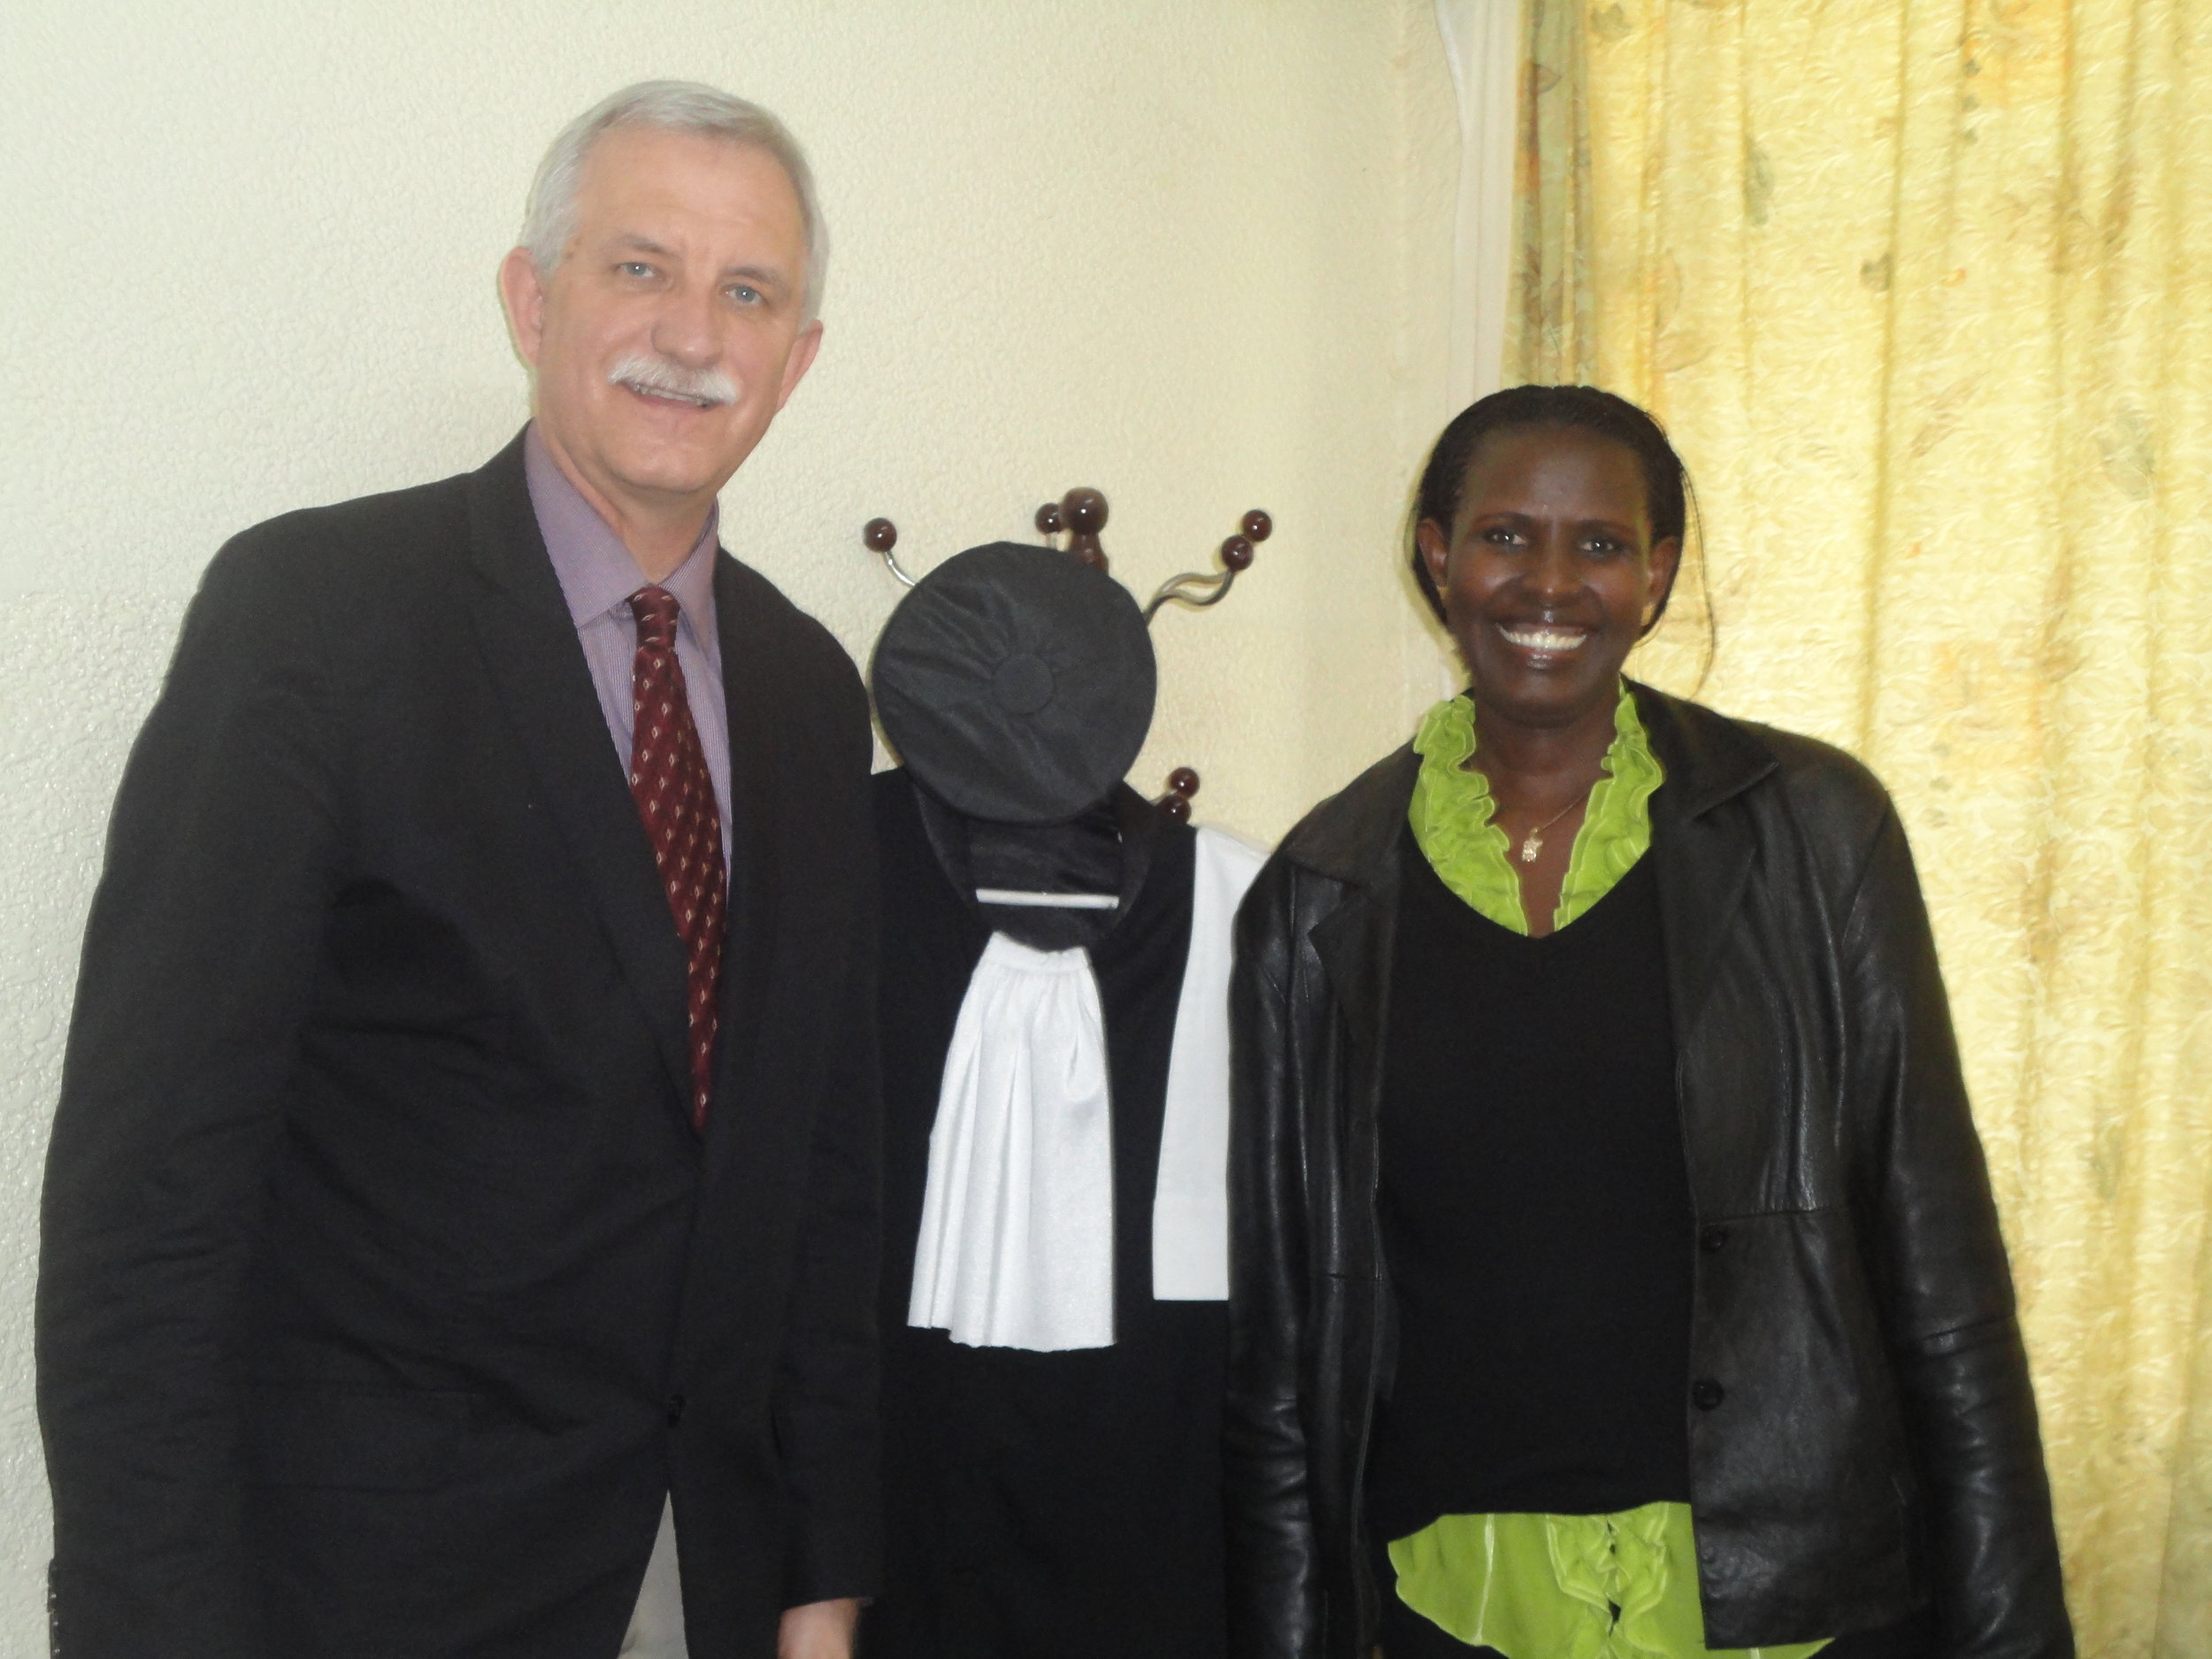 Gary Janzen with Judge Esther